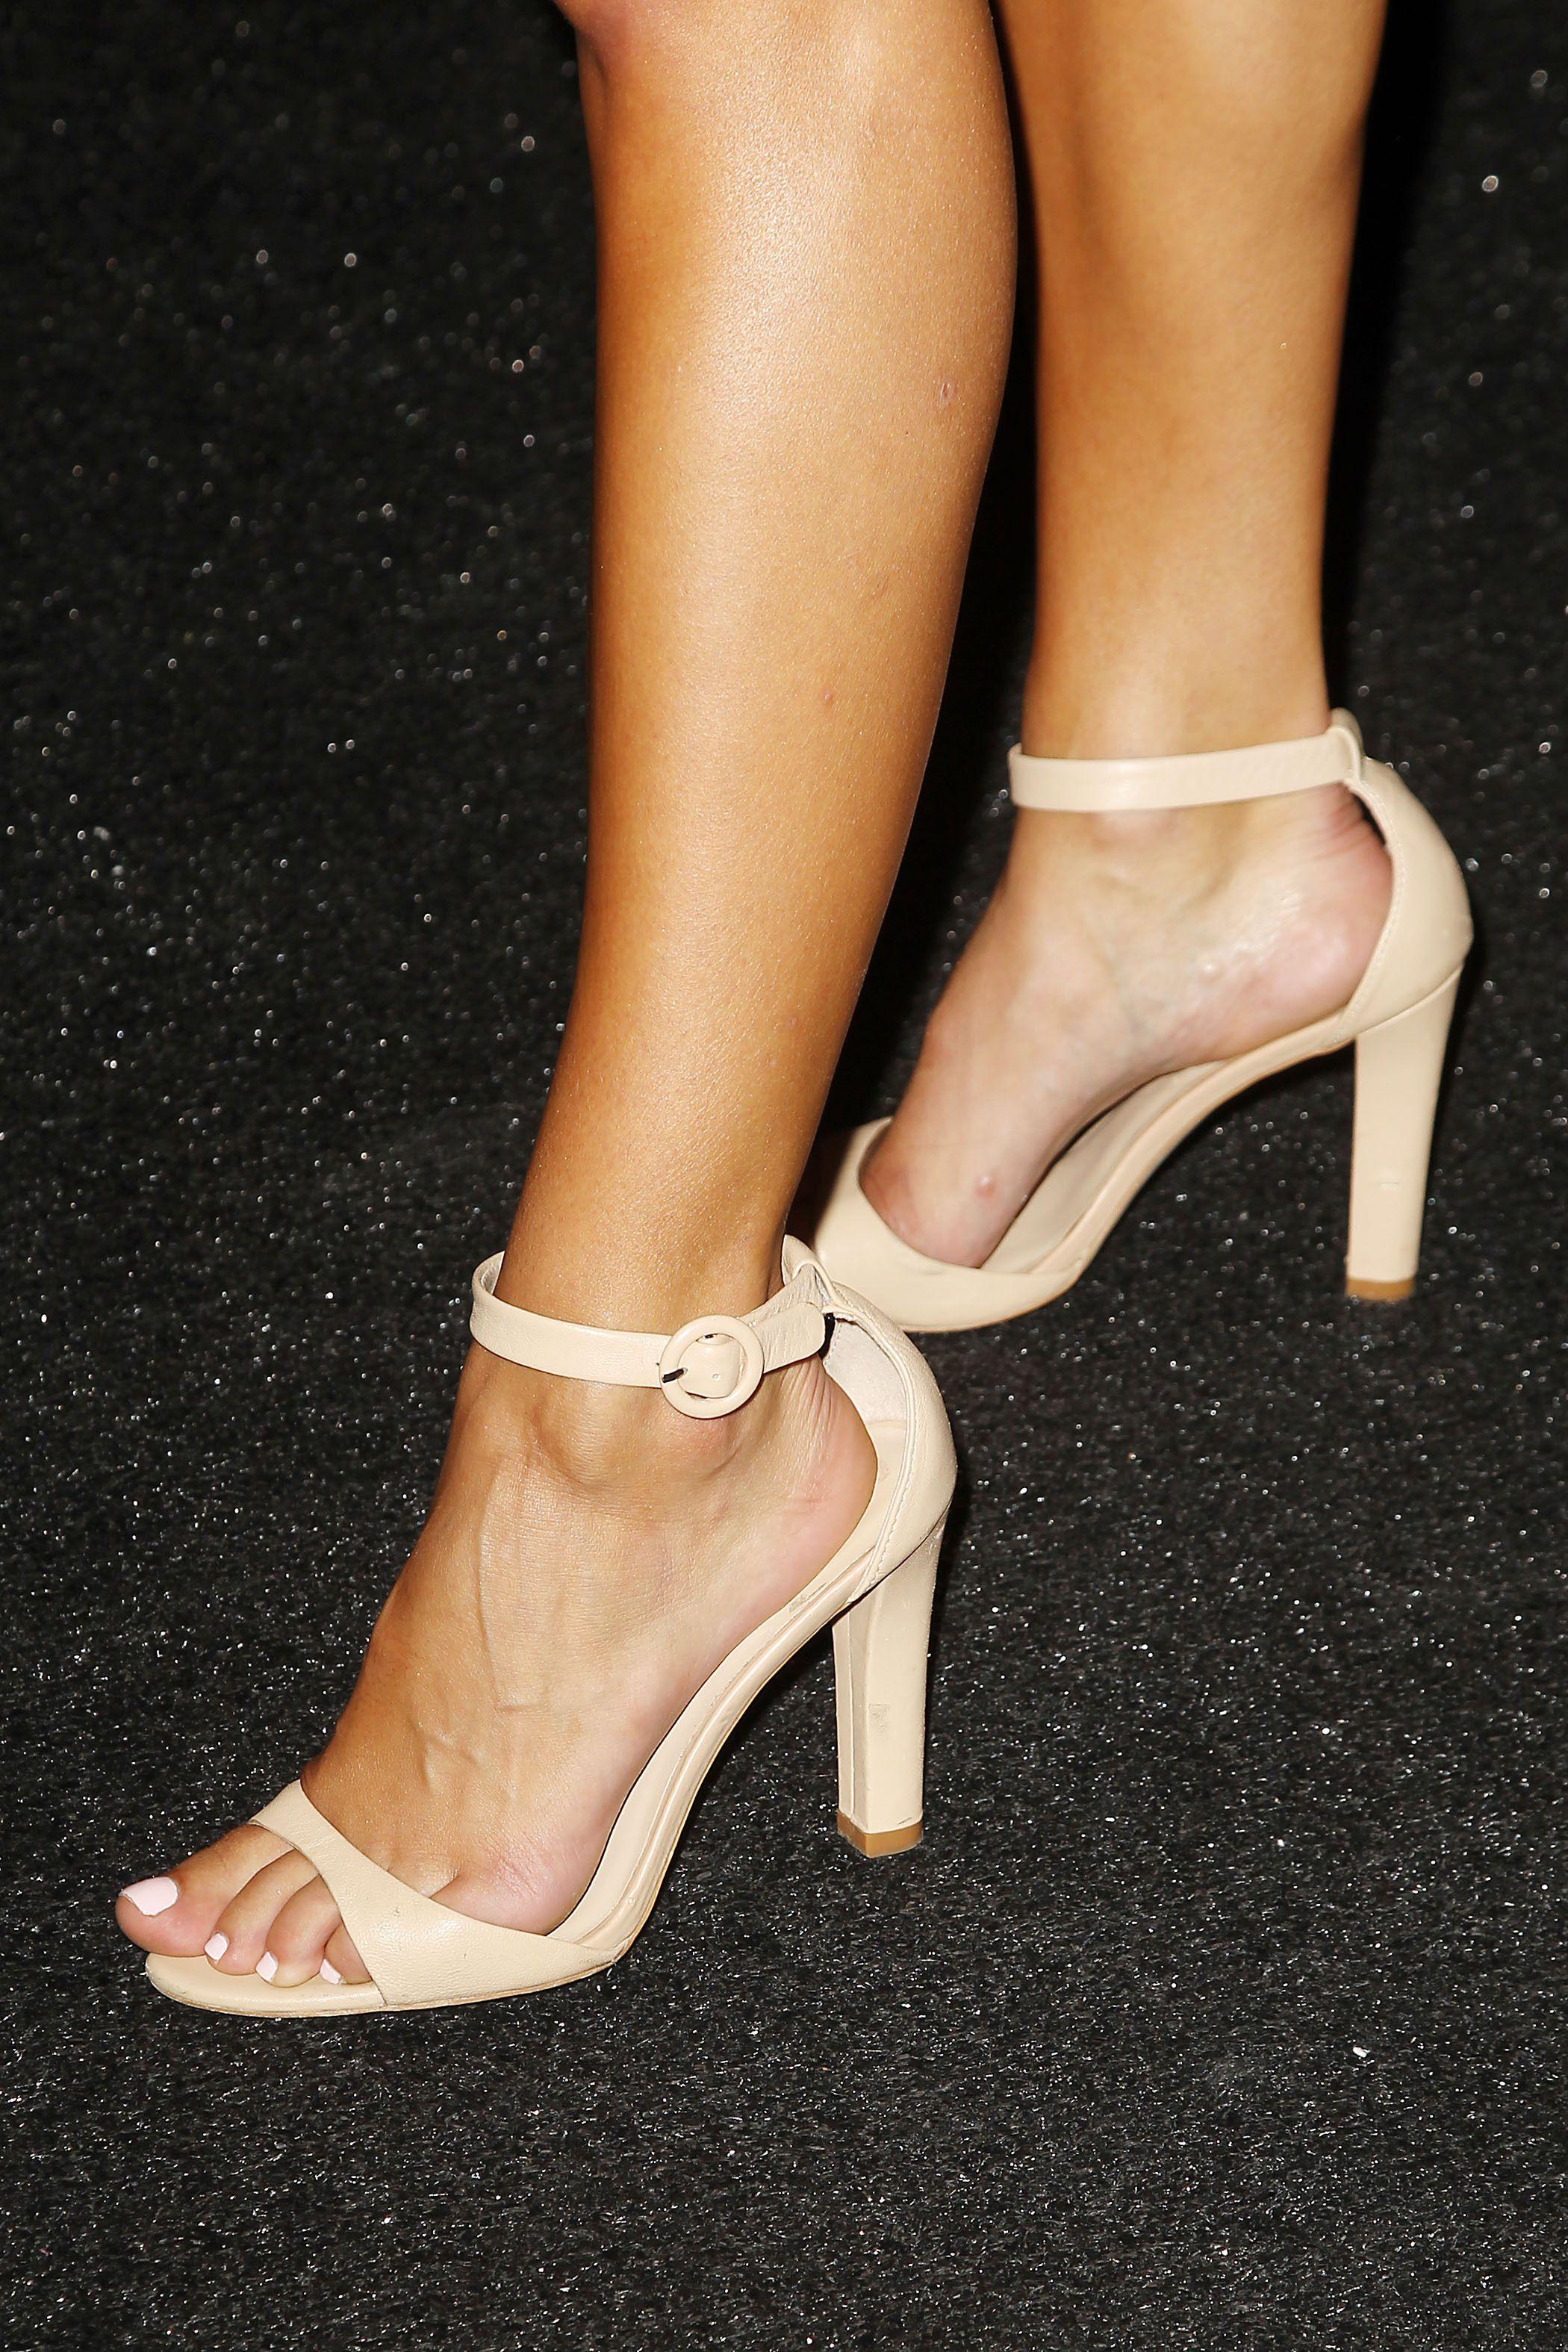 Nina agdal feet naked (35 image)